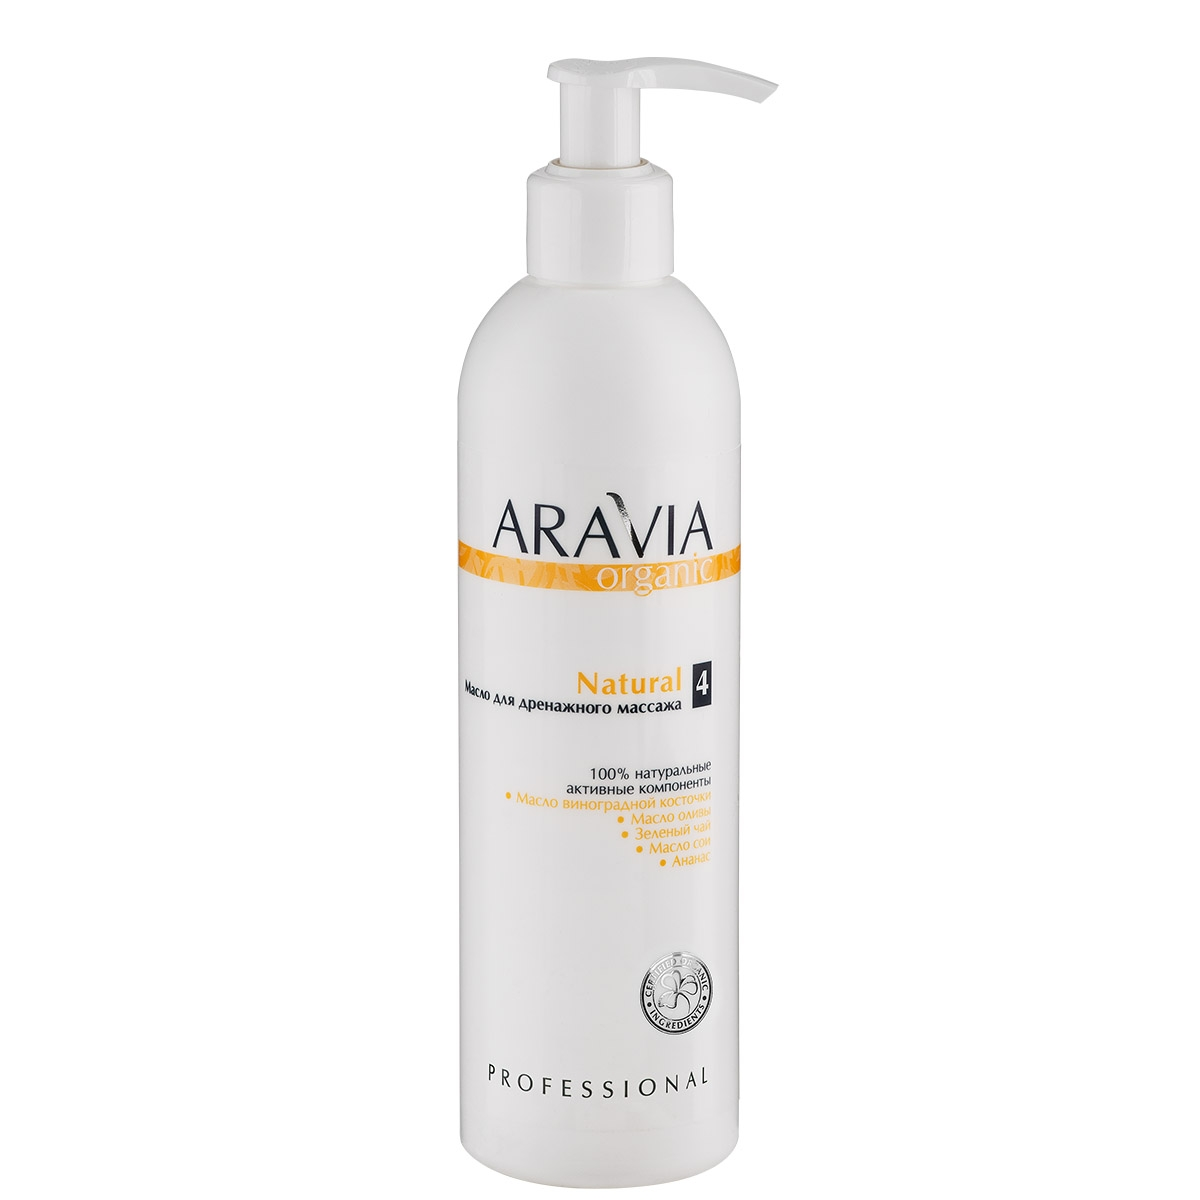 ARAVIA ARAVIA Organic Масло для Дренажного Массажа «Natural», 300 мл